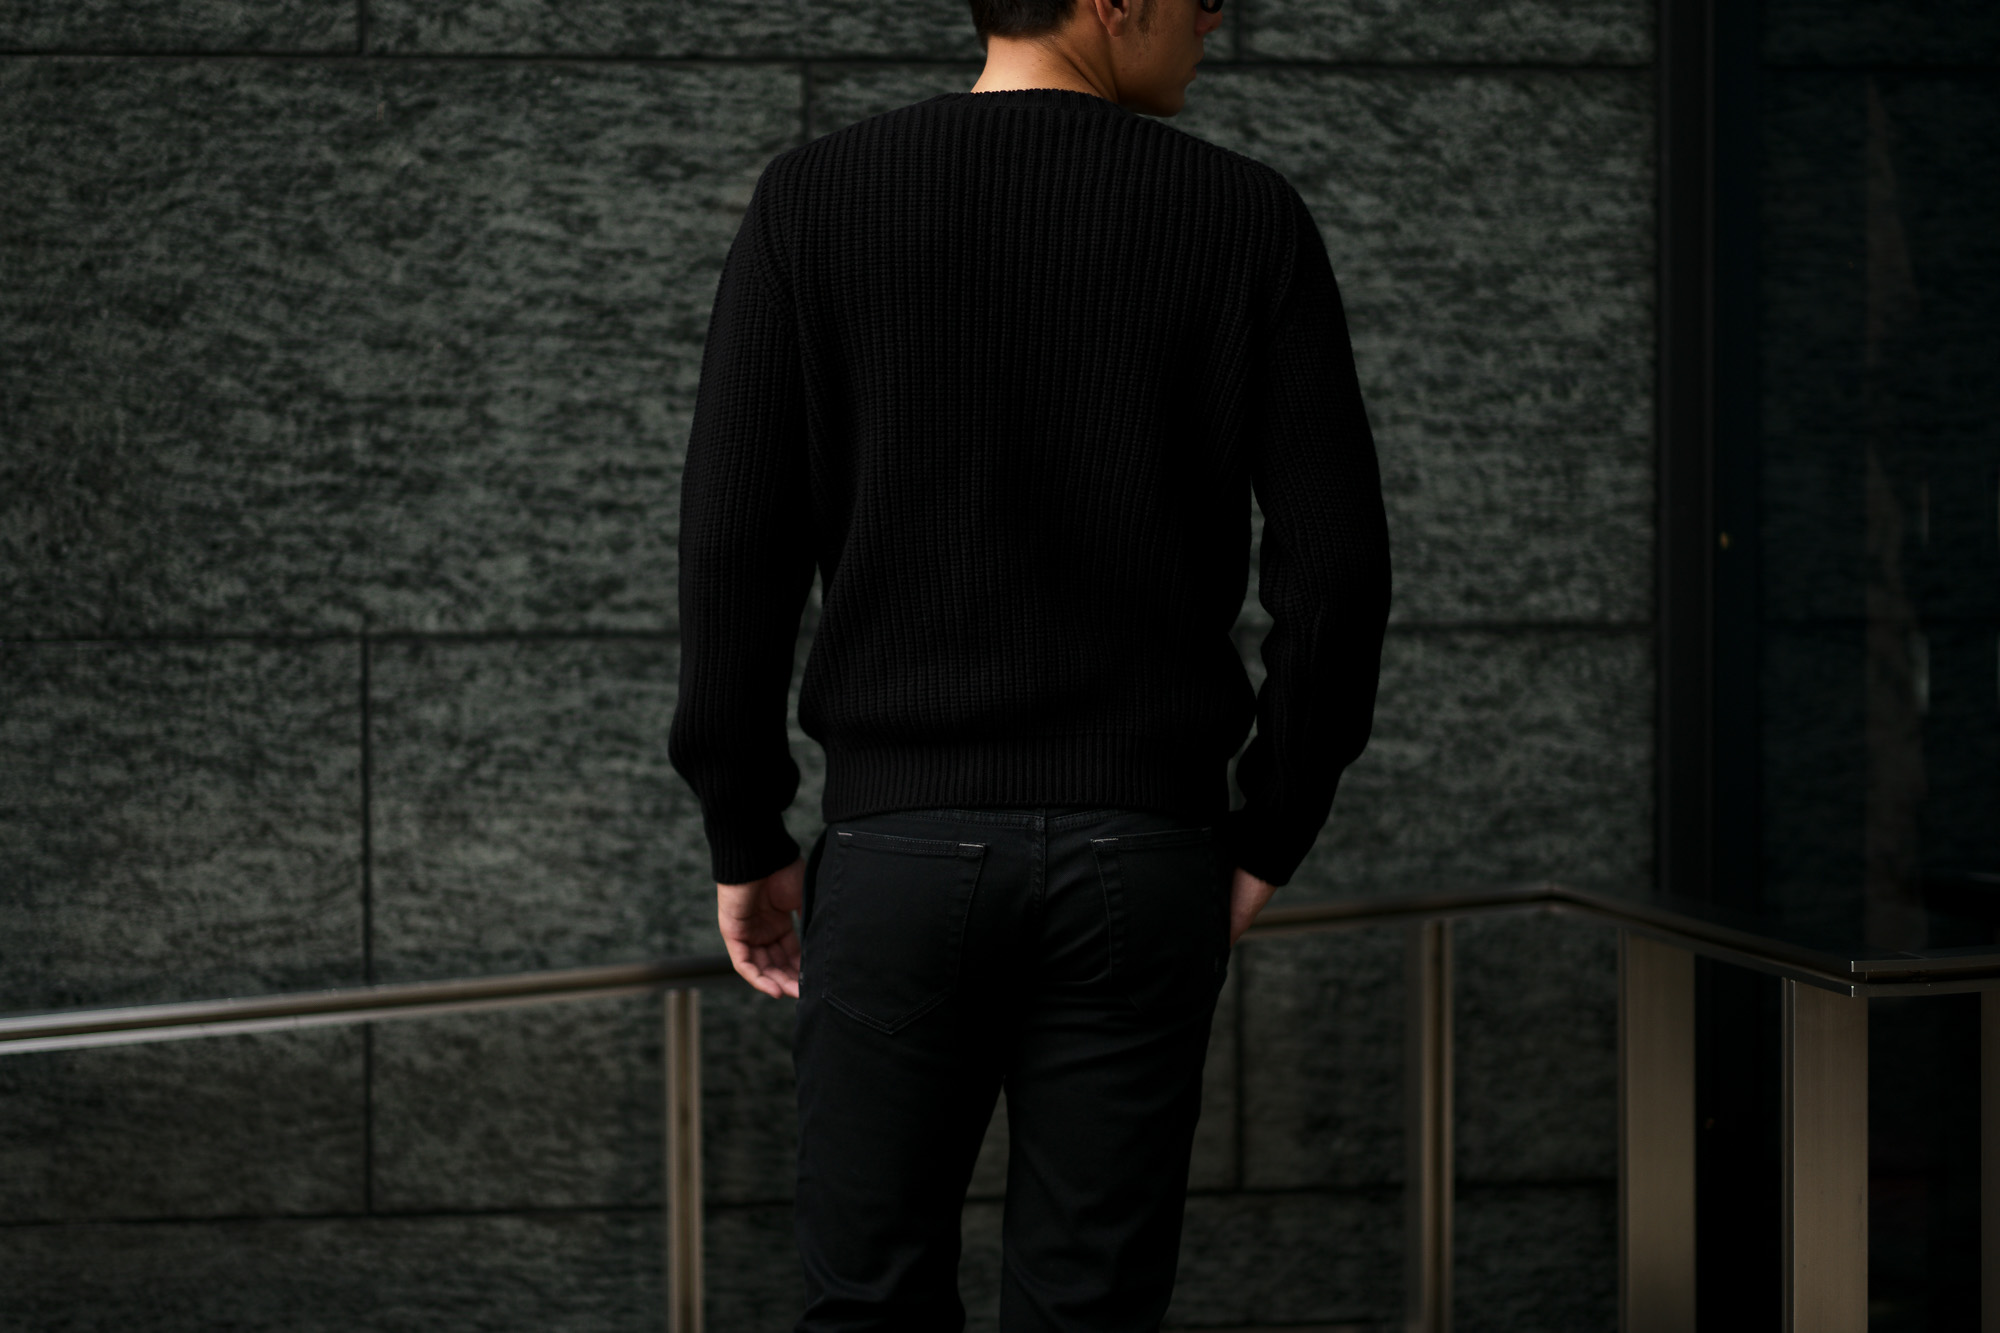 Settefili Cashmere (セッテフィーリ カシミア) Cashmere Crew Neck Sweater ローゲージ カシミアニット セーター BLACK (ブラック・CG102) made in italy (イタリア製) 2019 秋冬新作 settefilicashmere 愛知 名古屋 altoediritto アルトエデリット カシミヤ